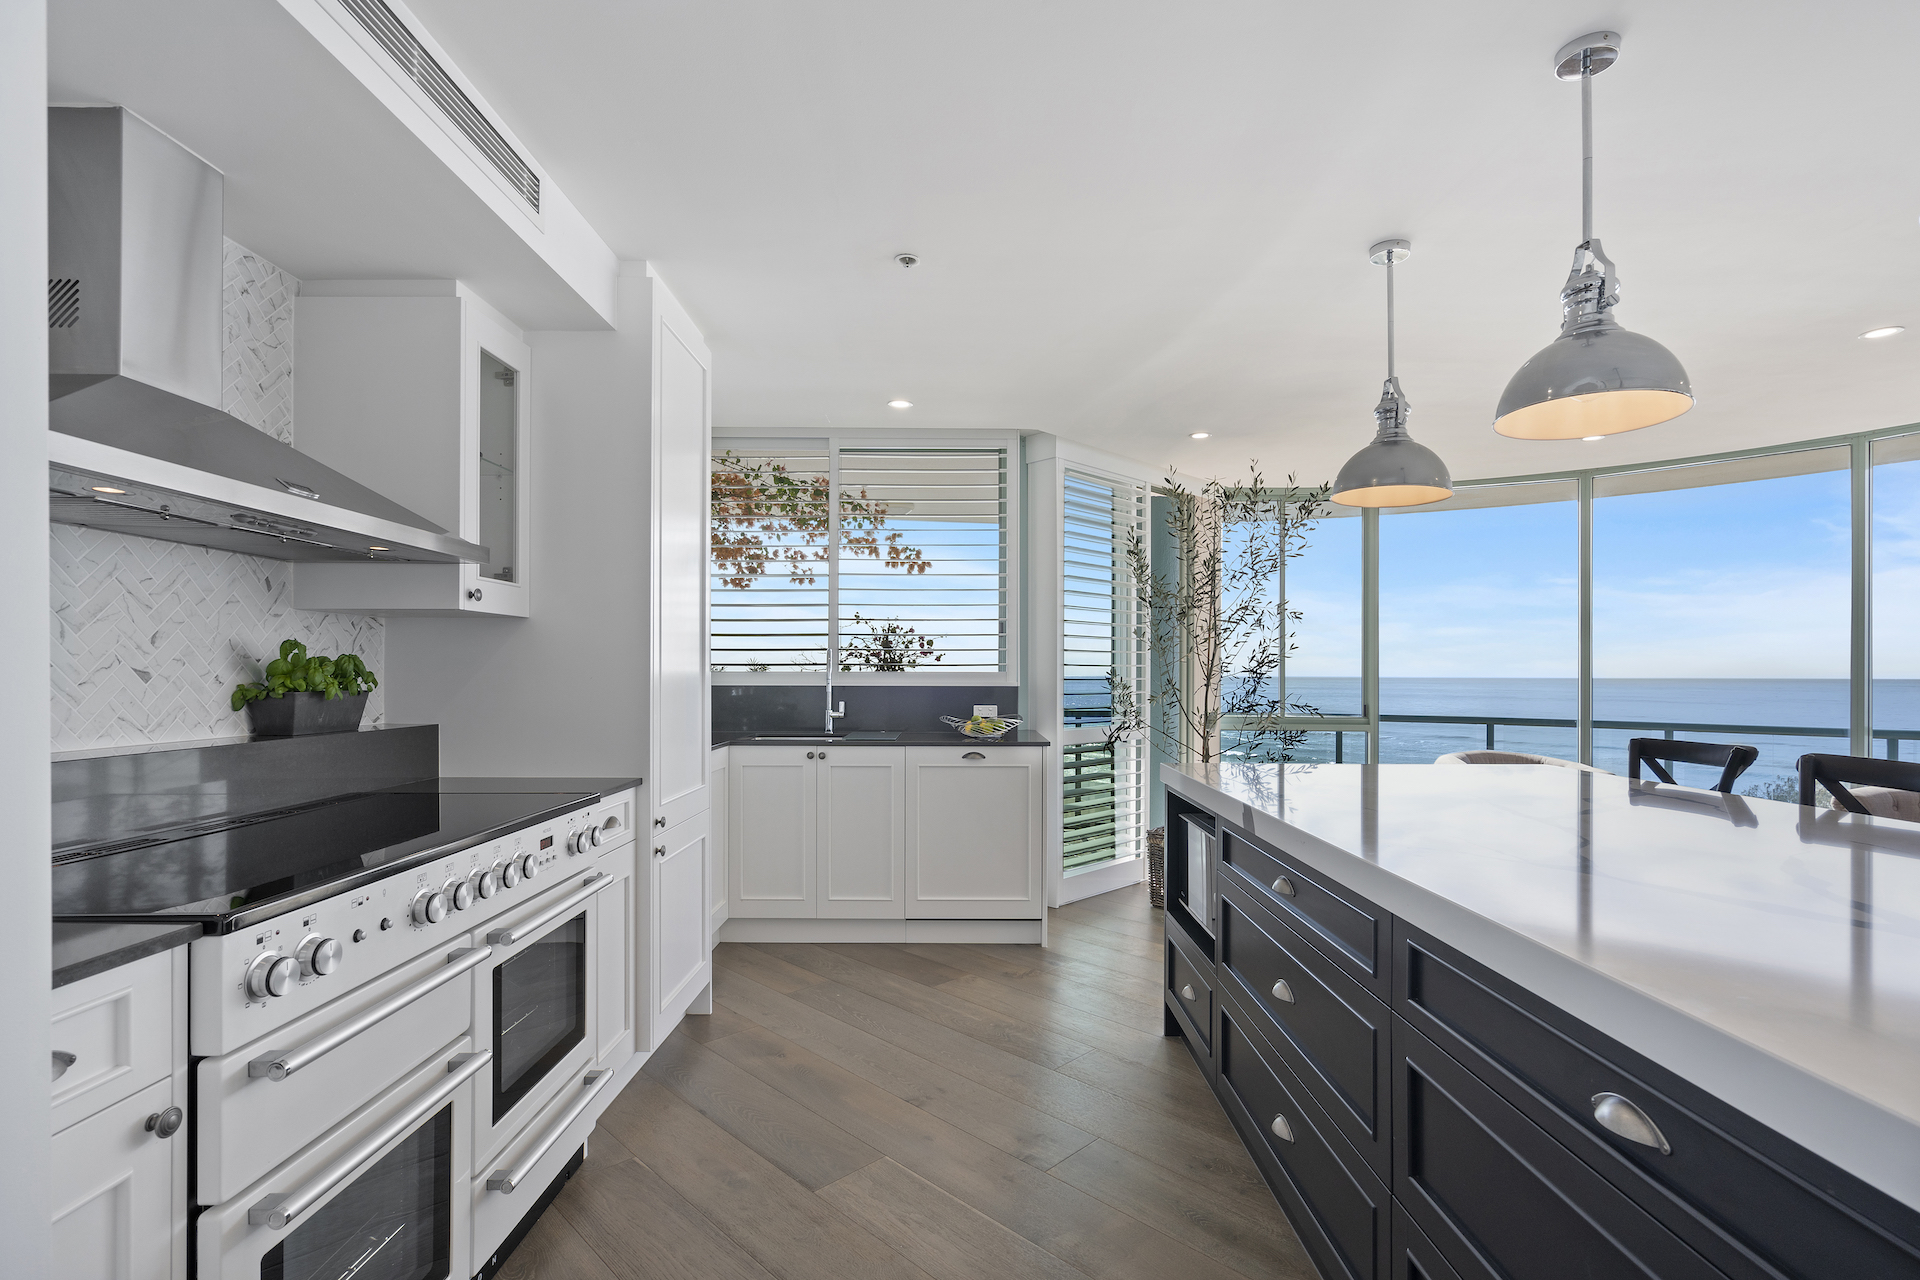 Hamptons kitchen renovation Gold coast